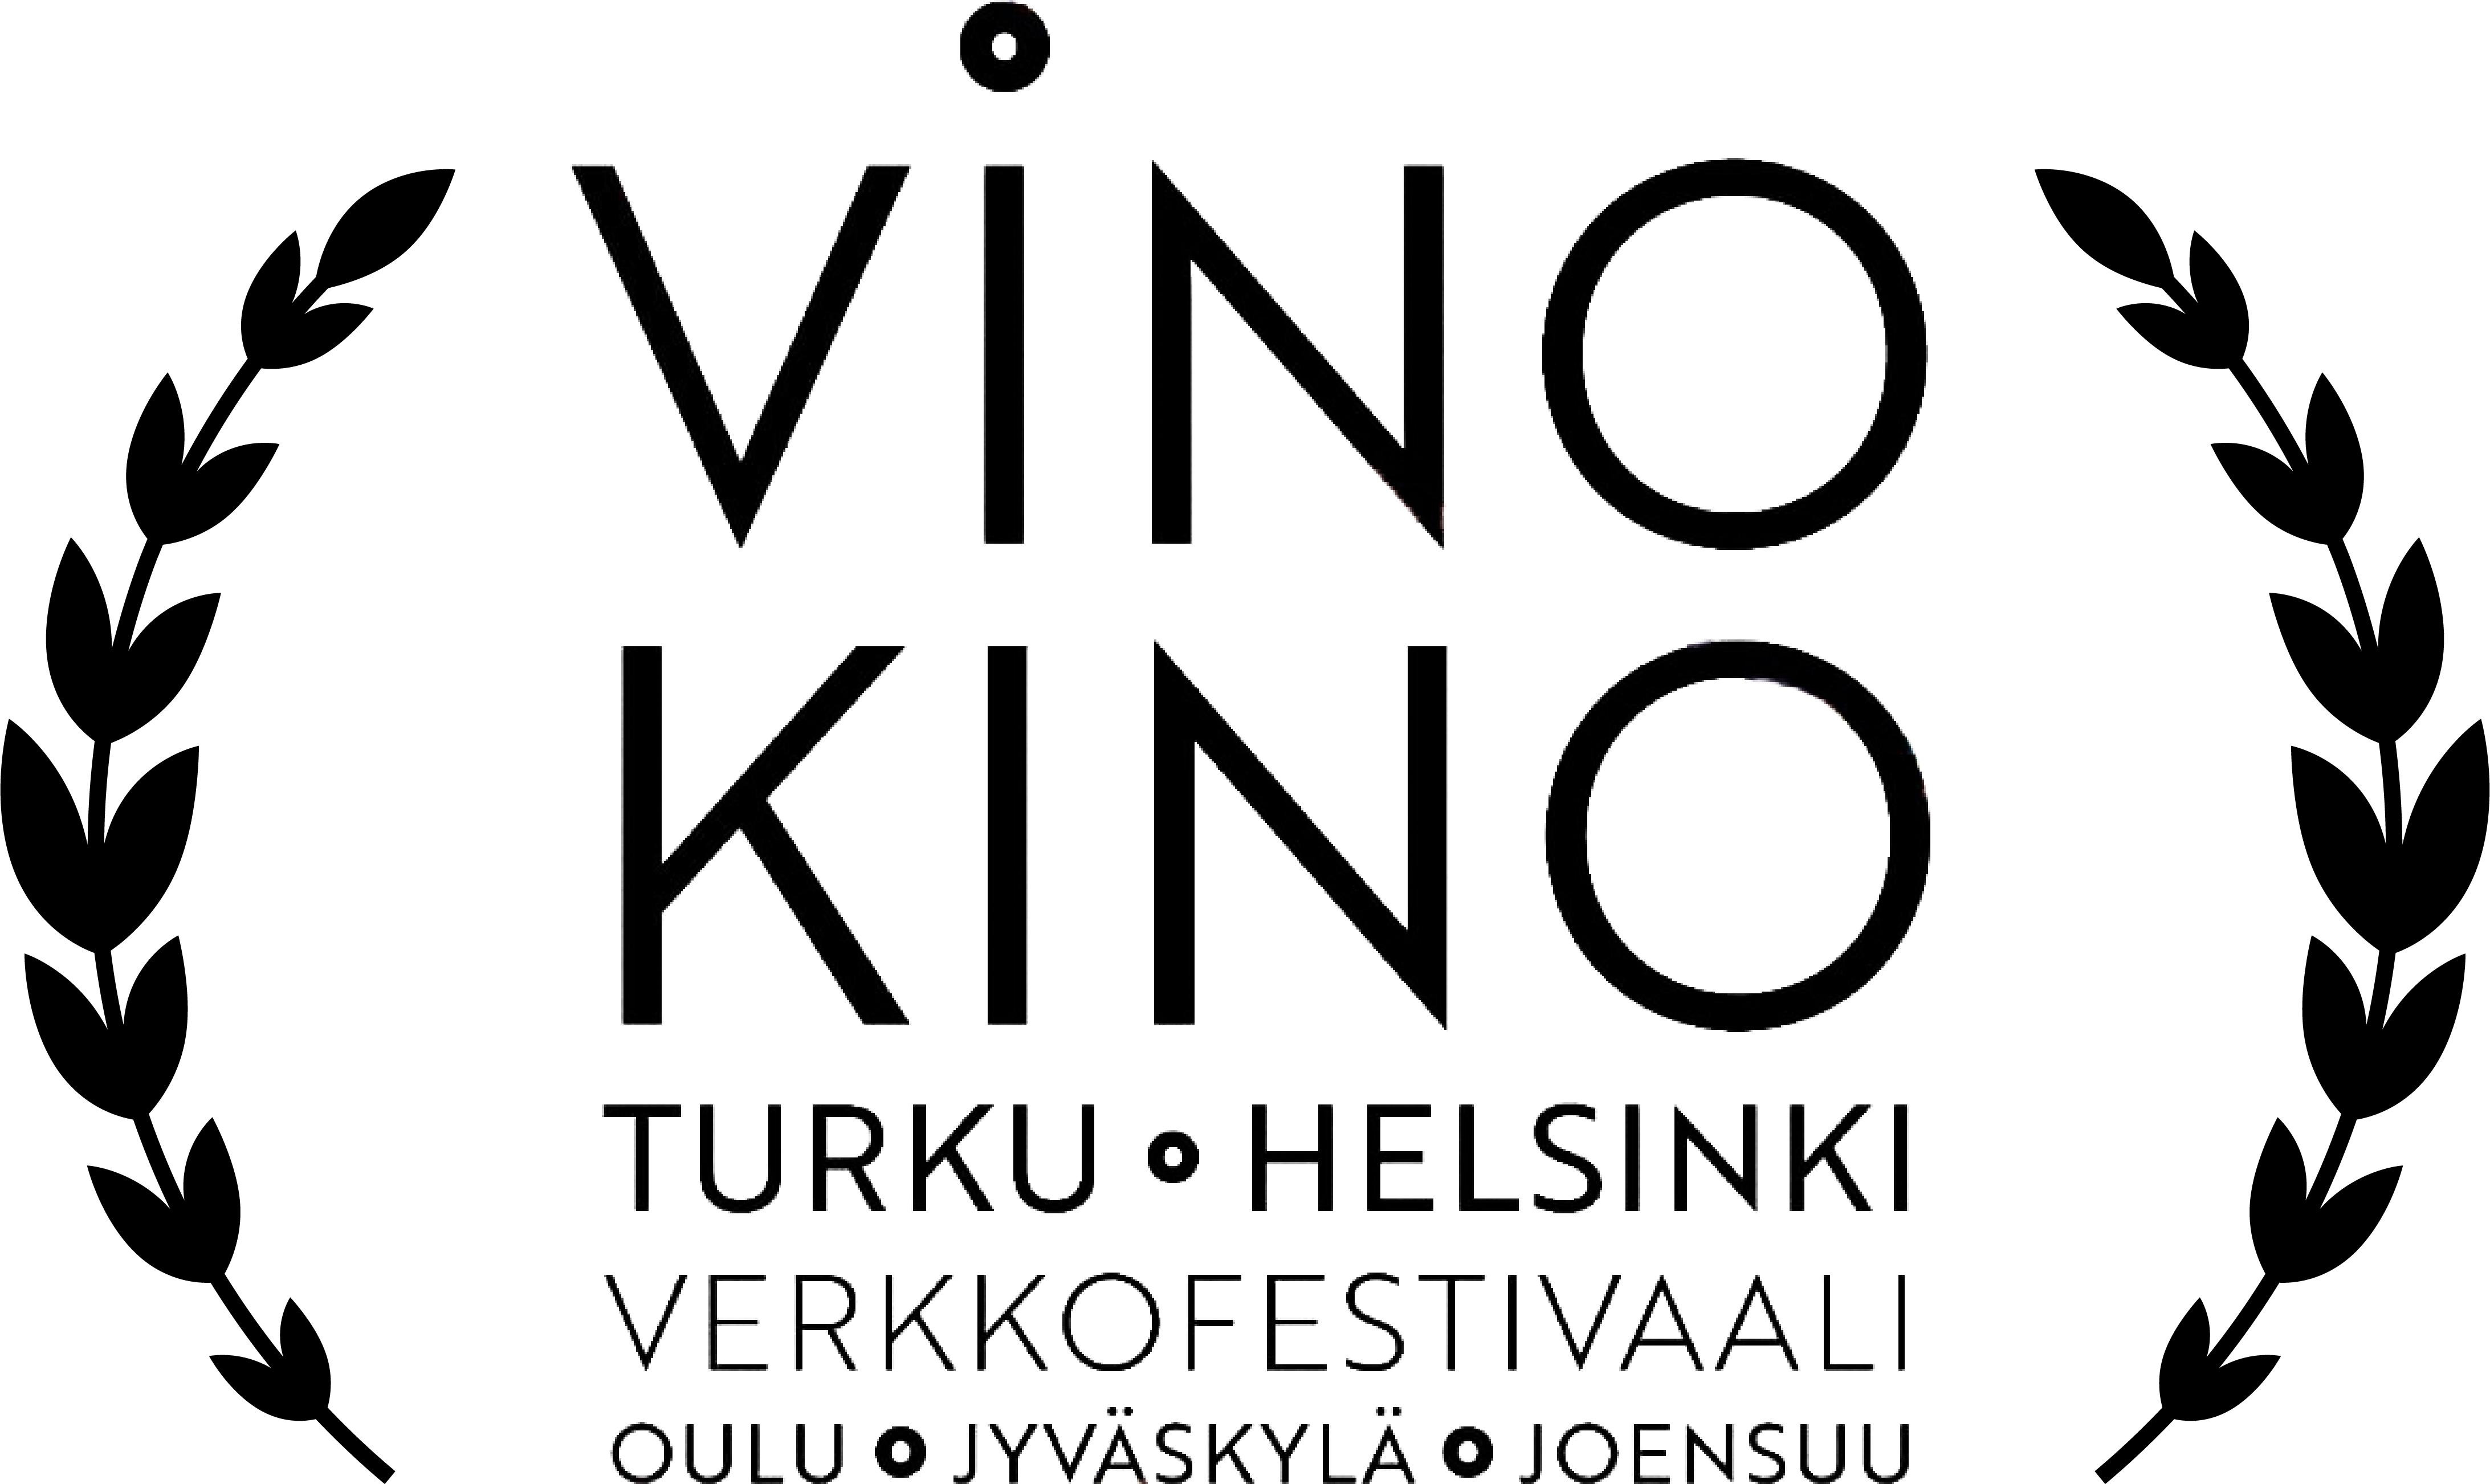 VinoKino LGBT Film Festival